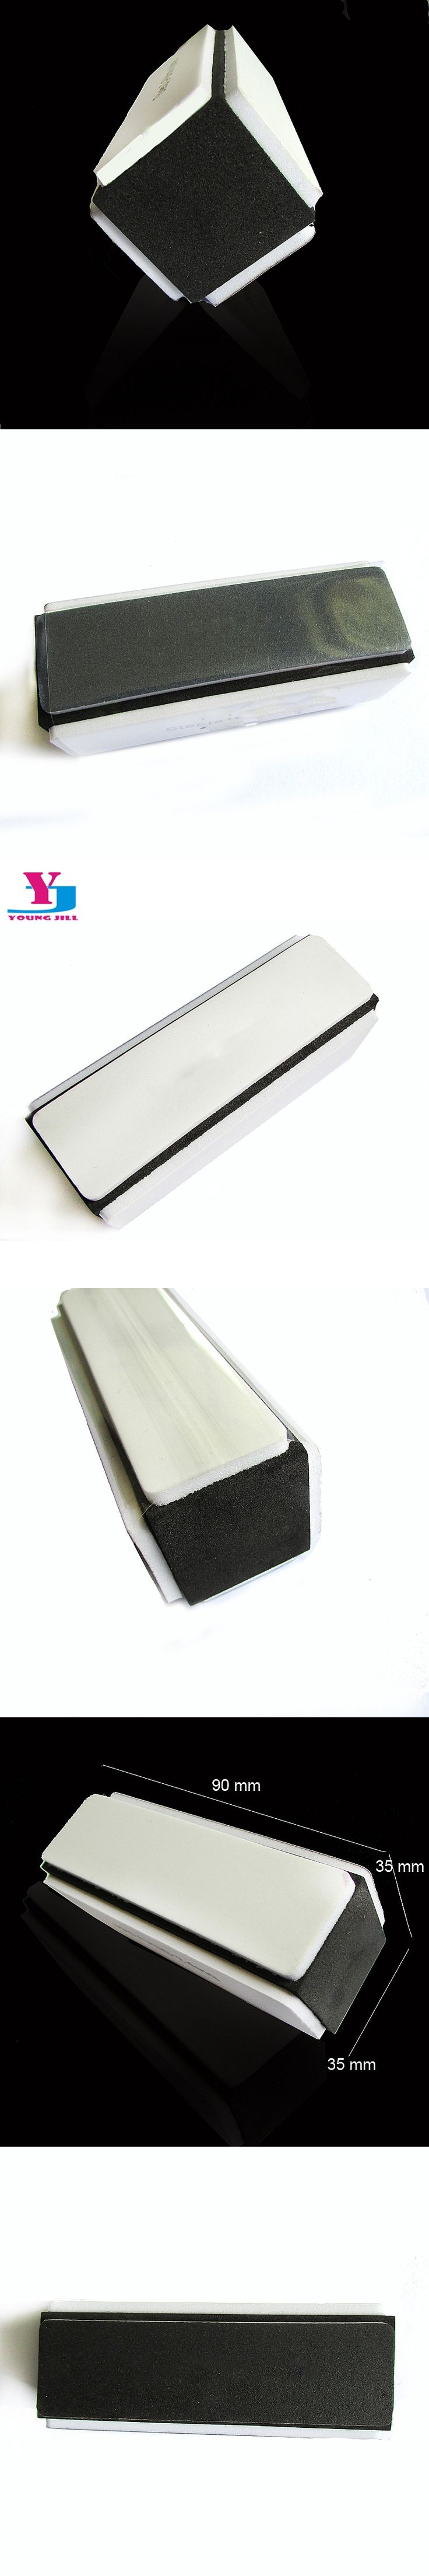 10pcs/Lot Sanding Block Nail Shiner Polish Buffer File Nail Care Nail Tools Beauty Manicure Nail Art Peidra De Moler Art Buffing